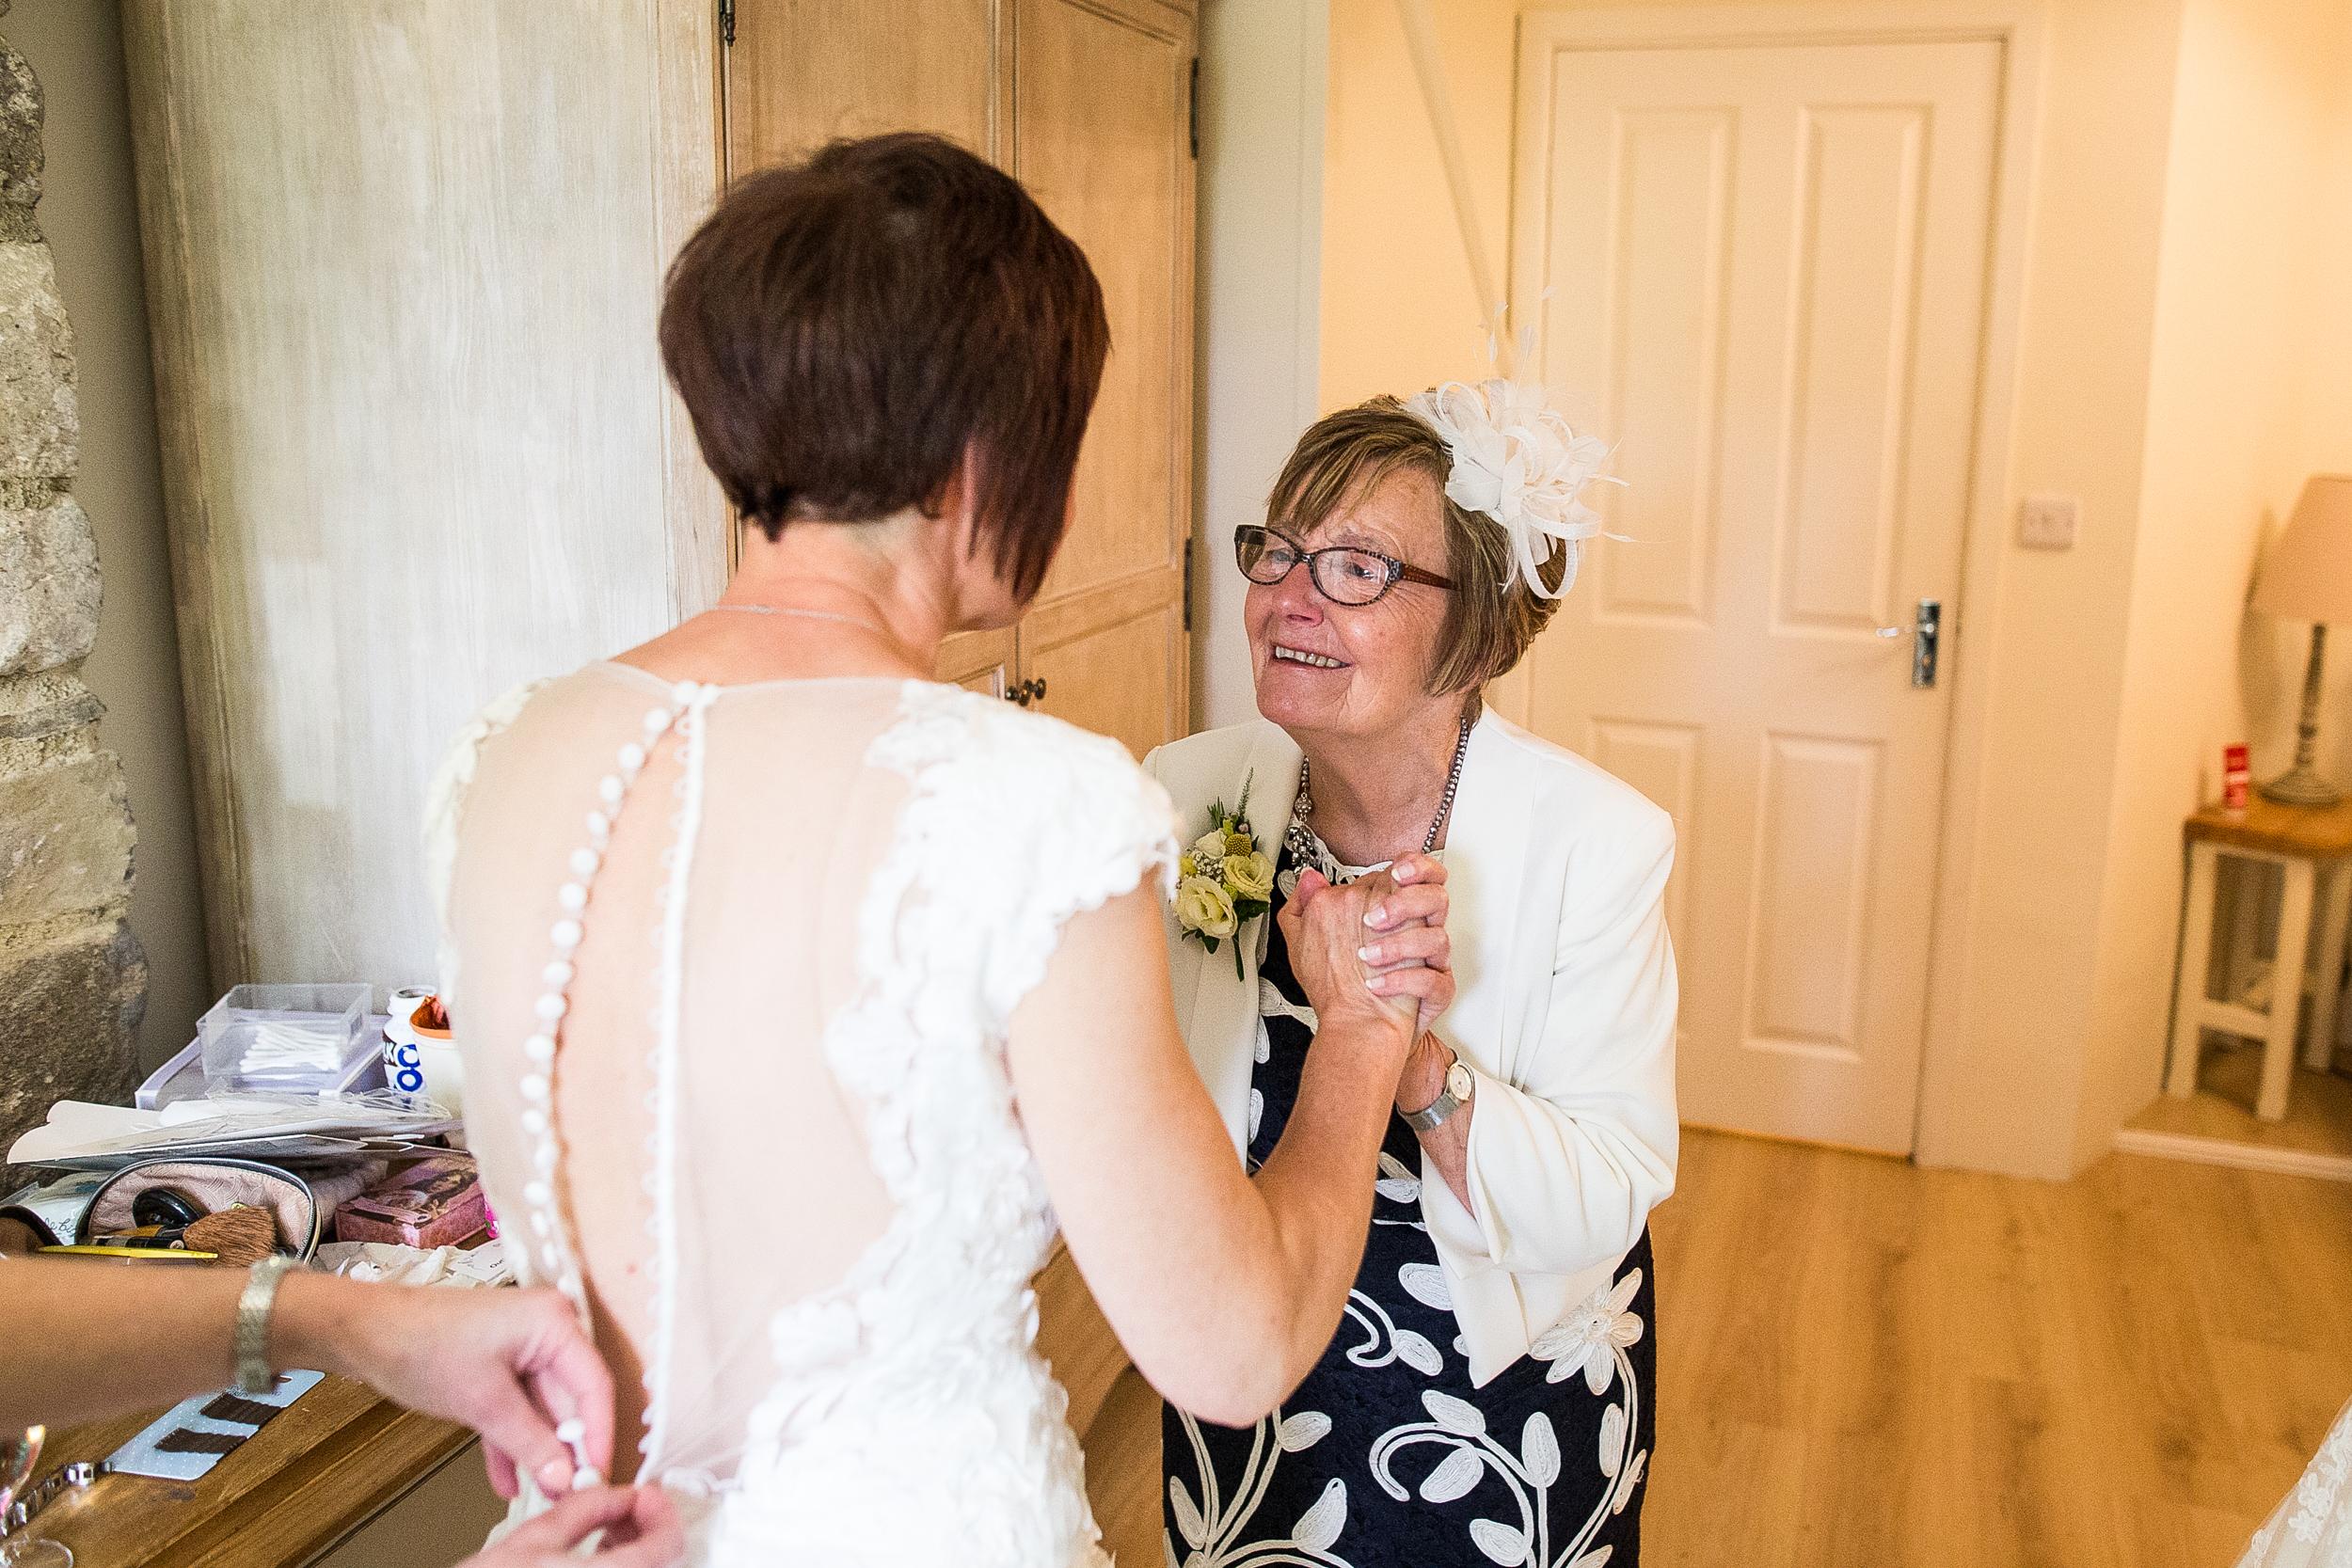 creative-wedding-photography-teesside-north-east-yorkshire-118.jpg